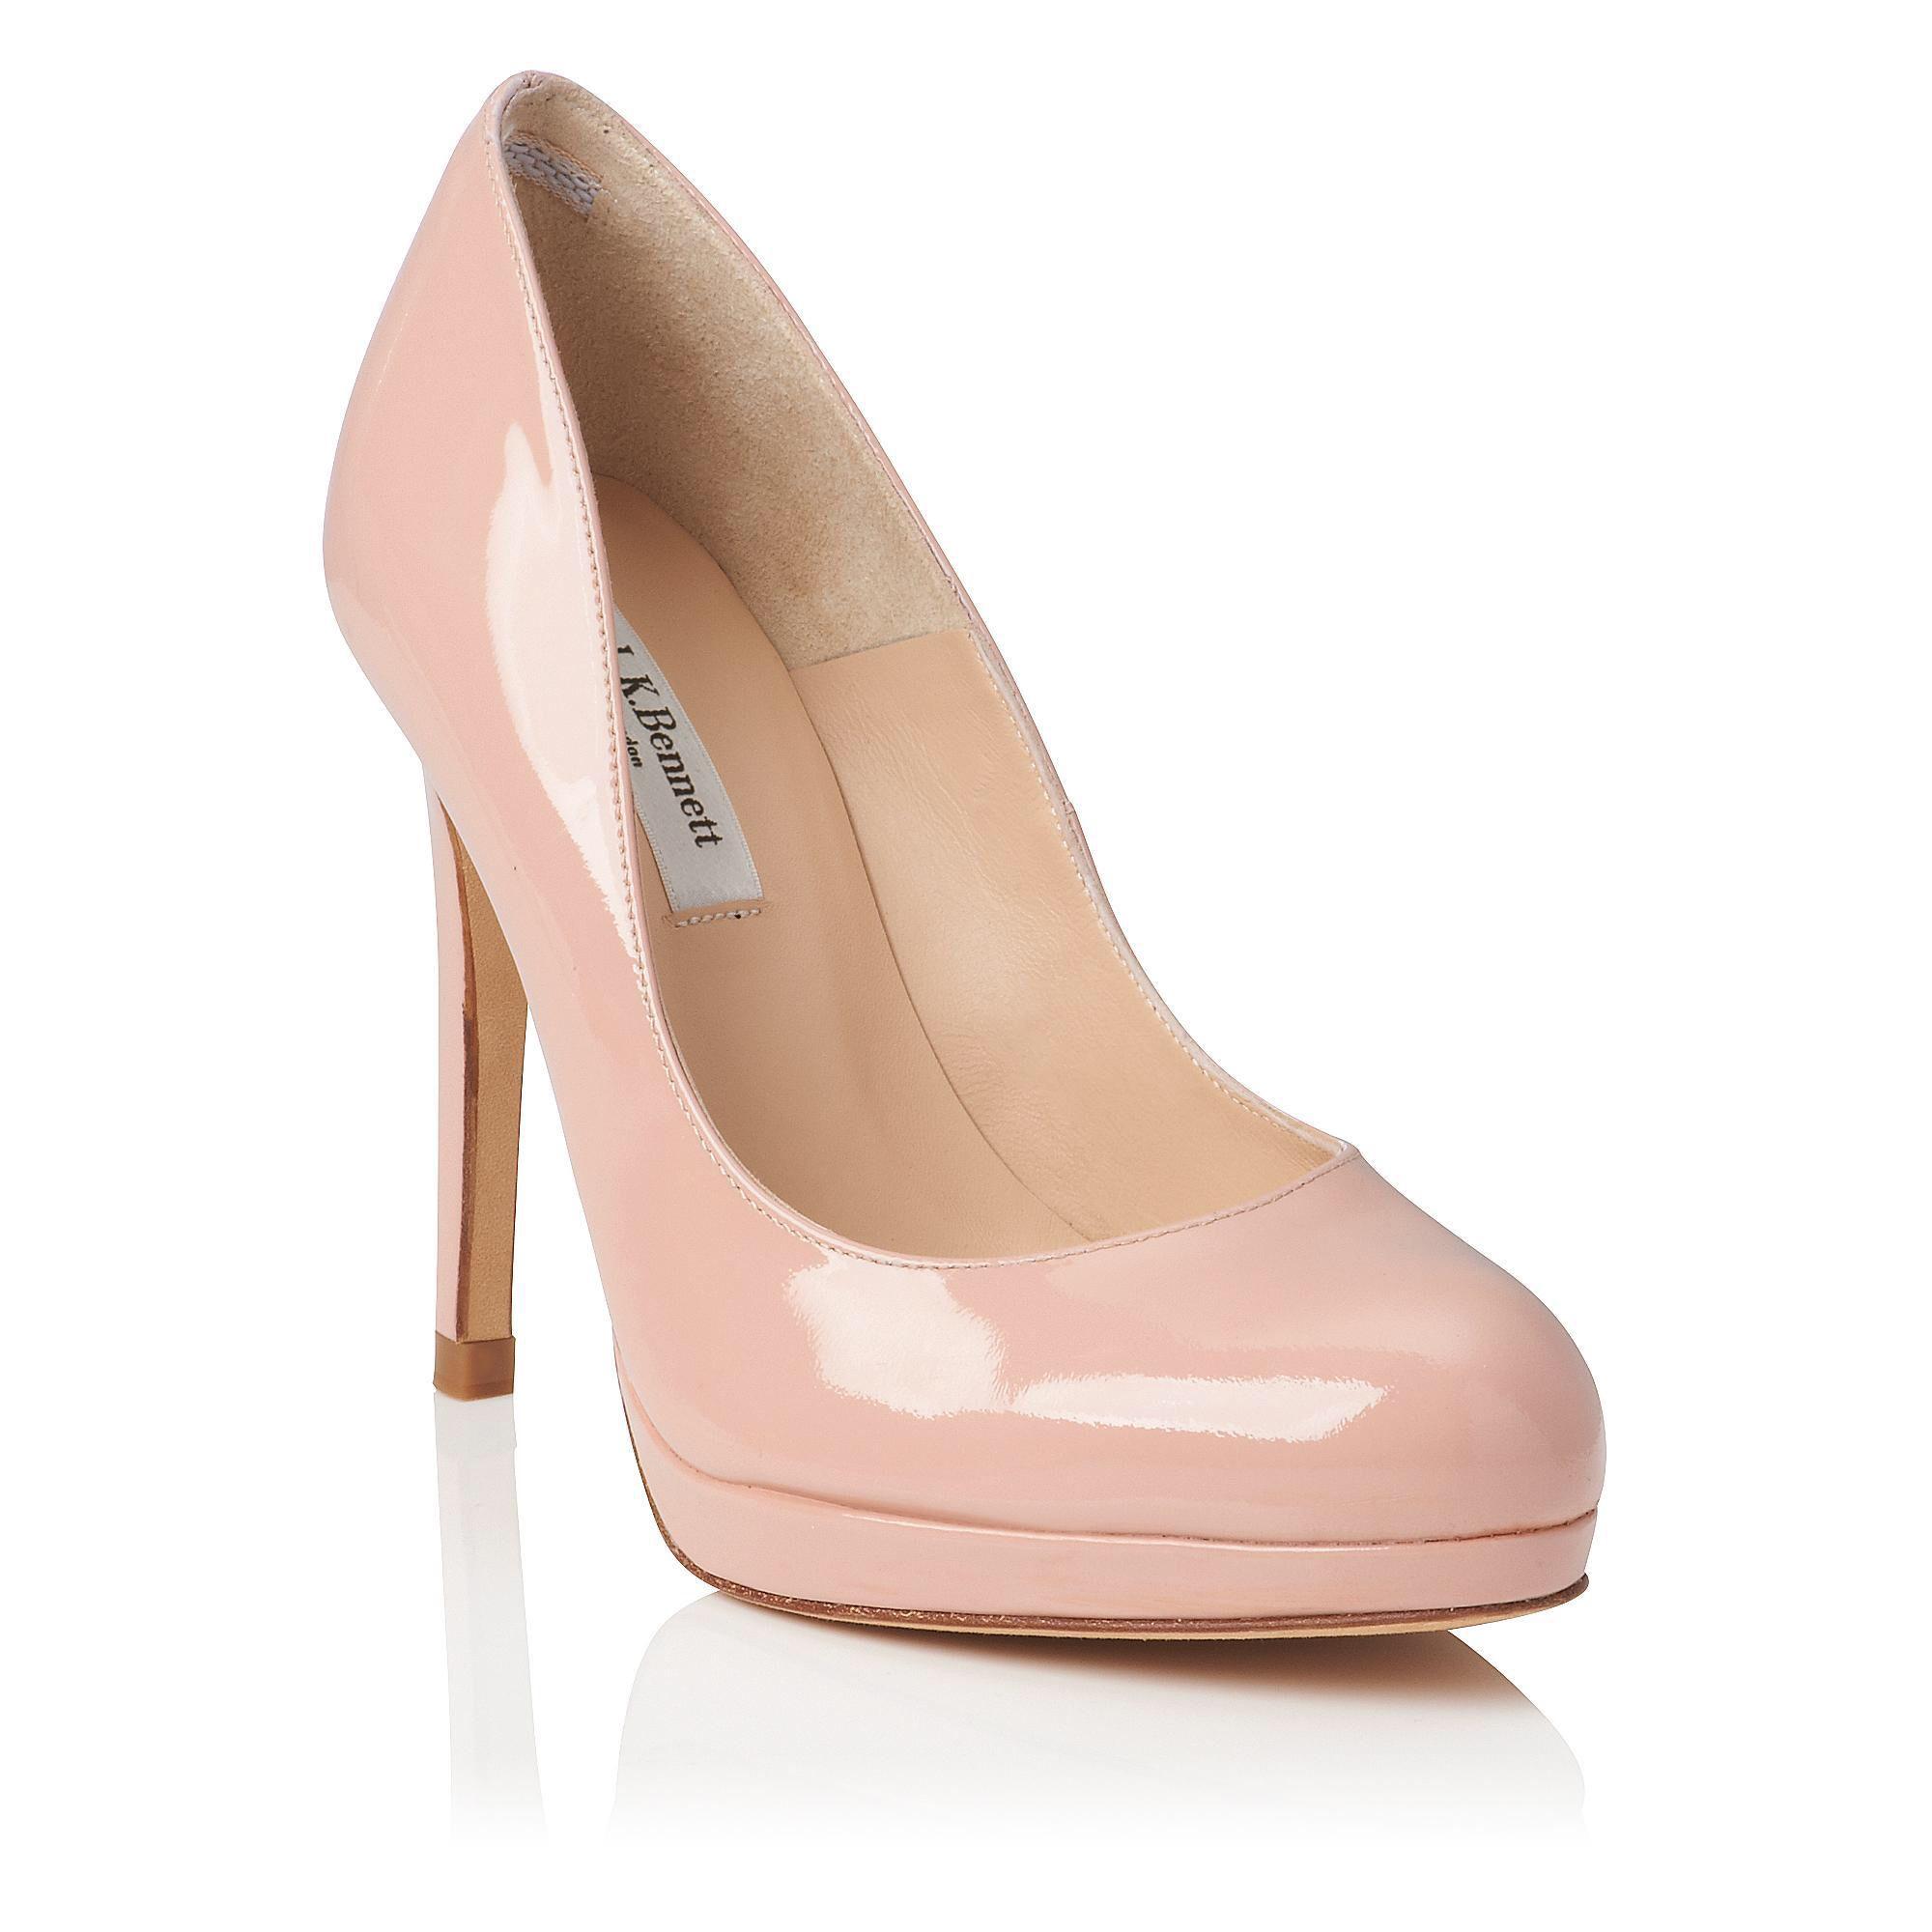 LK Bennett Sledge Patent court shoe | Boot shoes women